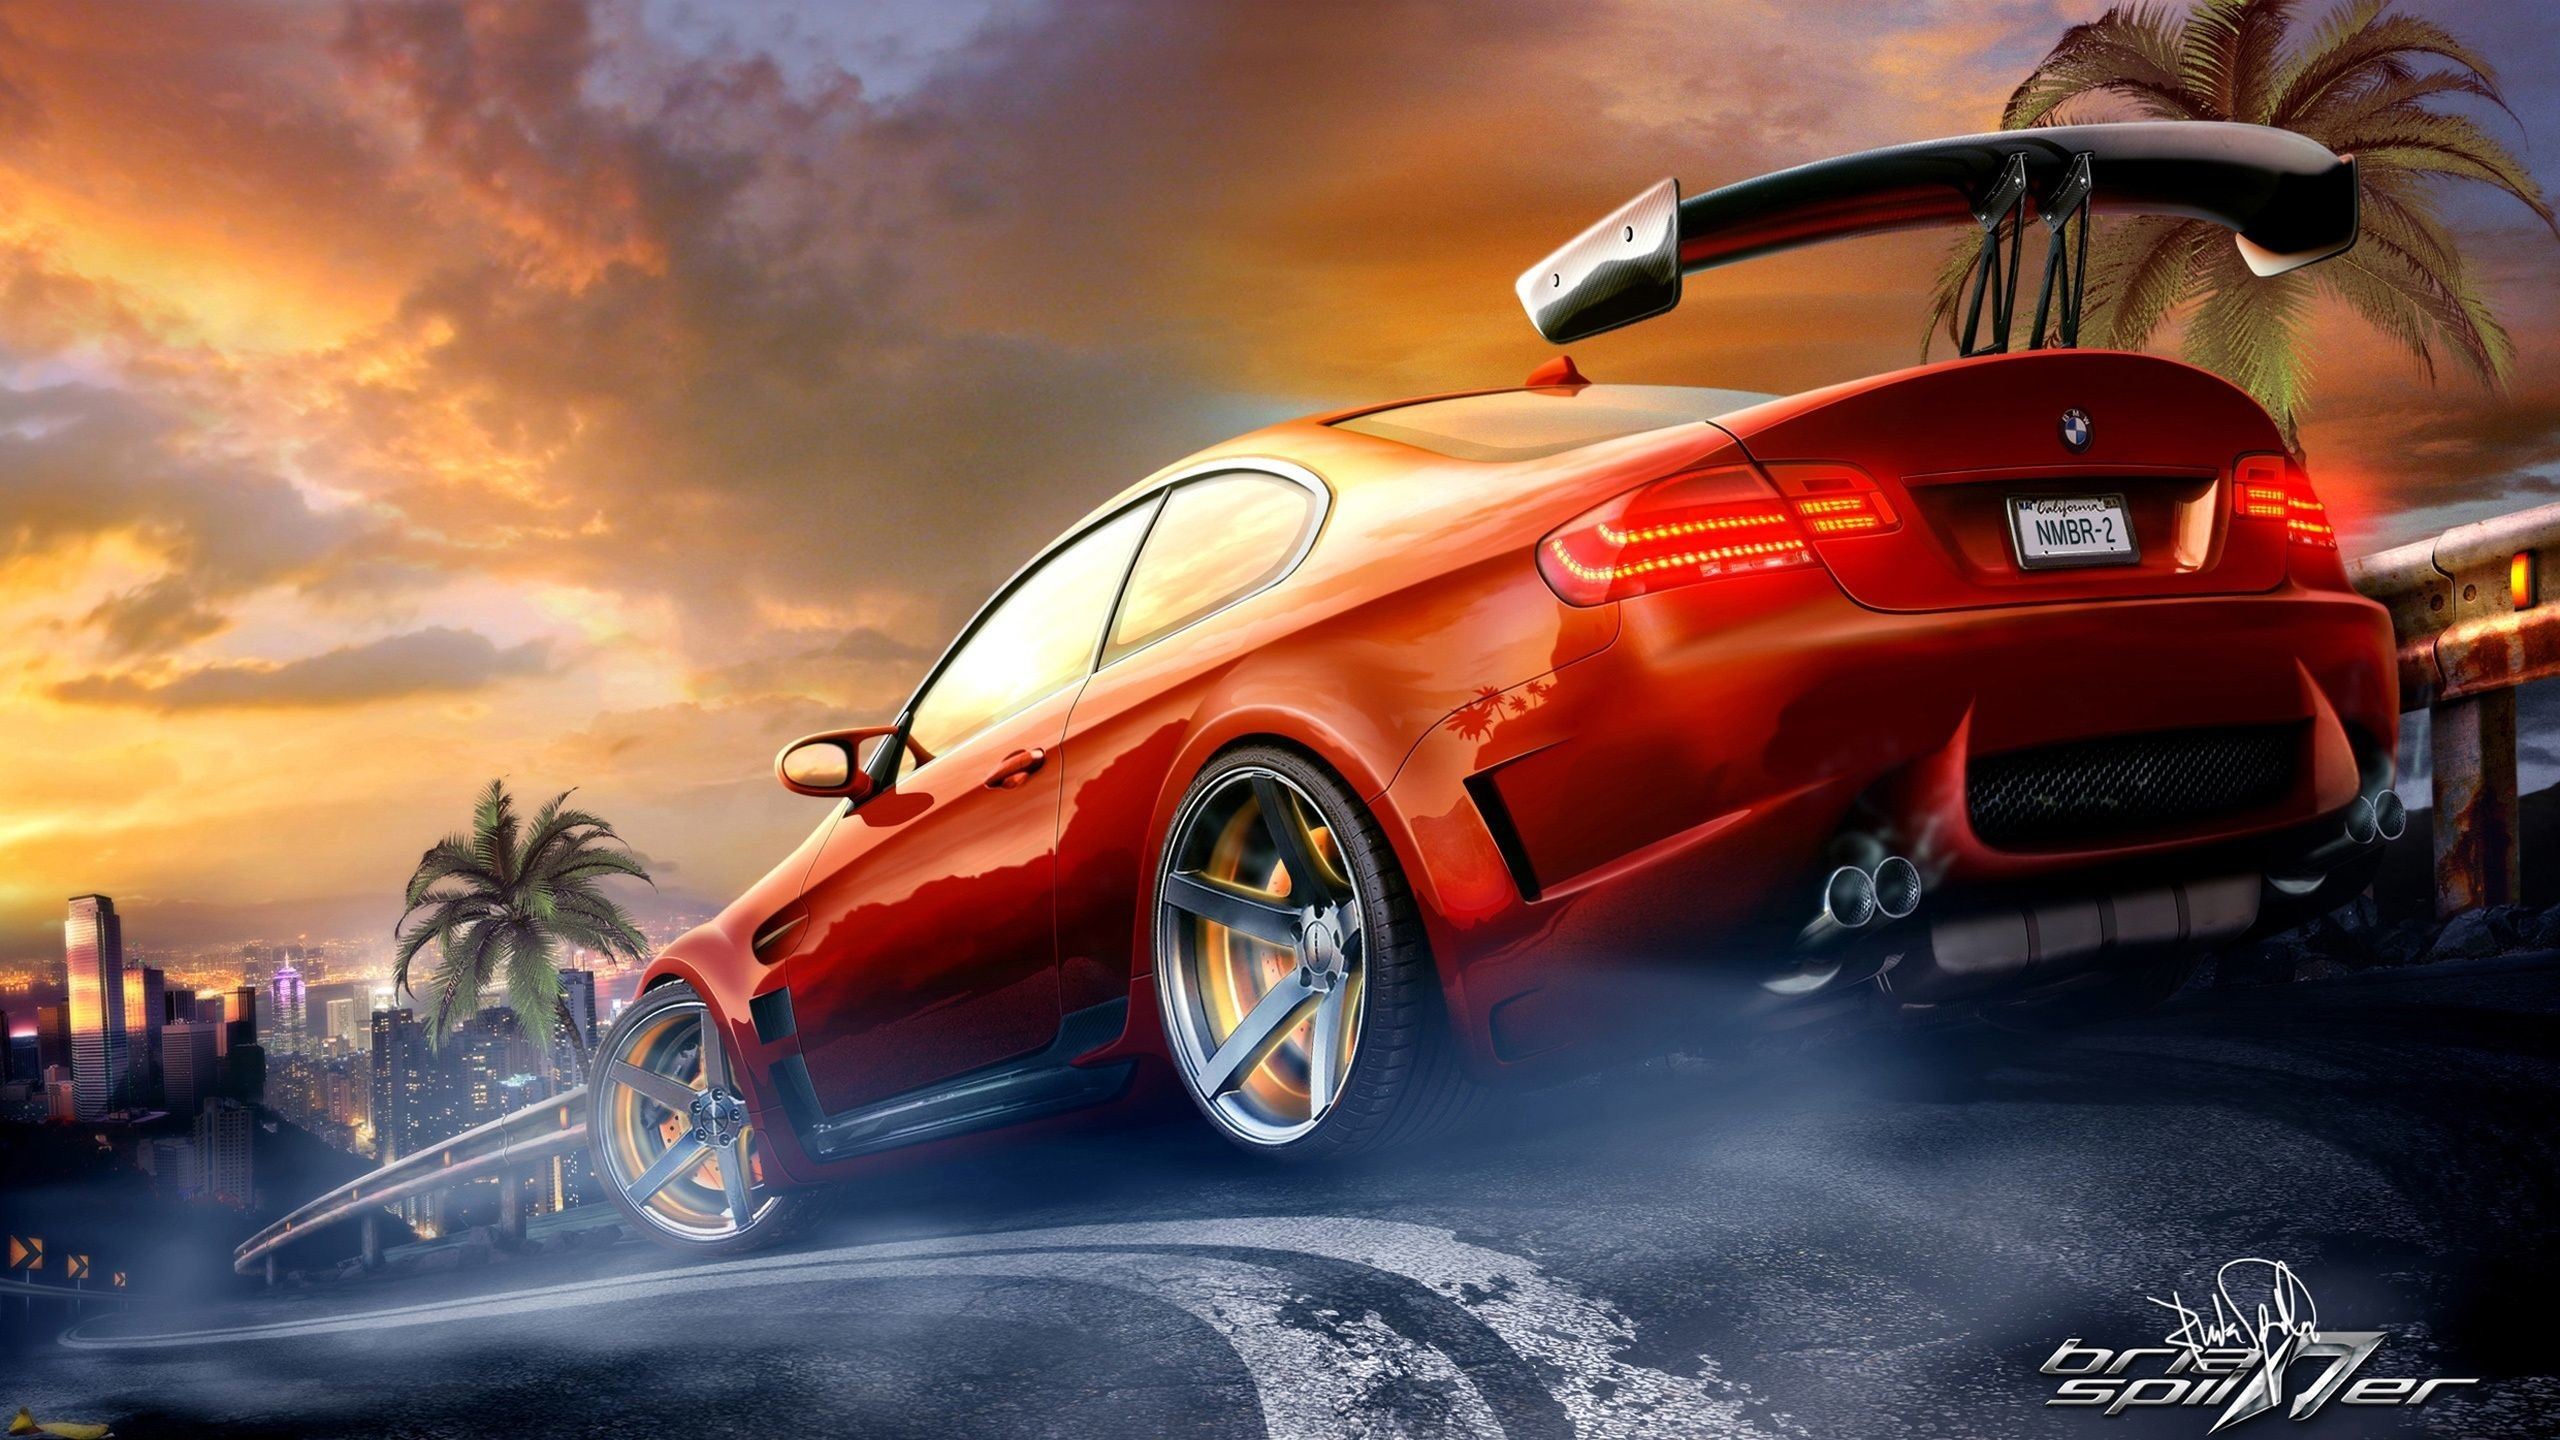 2560x1440 Street Racing Cars Wallpapers Desktop Pc Racing Car Wallpaper Hd Pc 2560x1440 Wallpaper Teahub Io